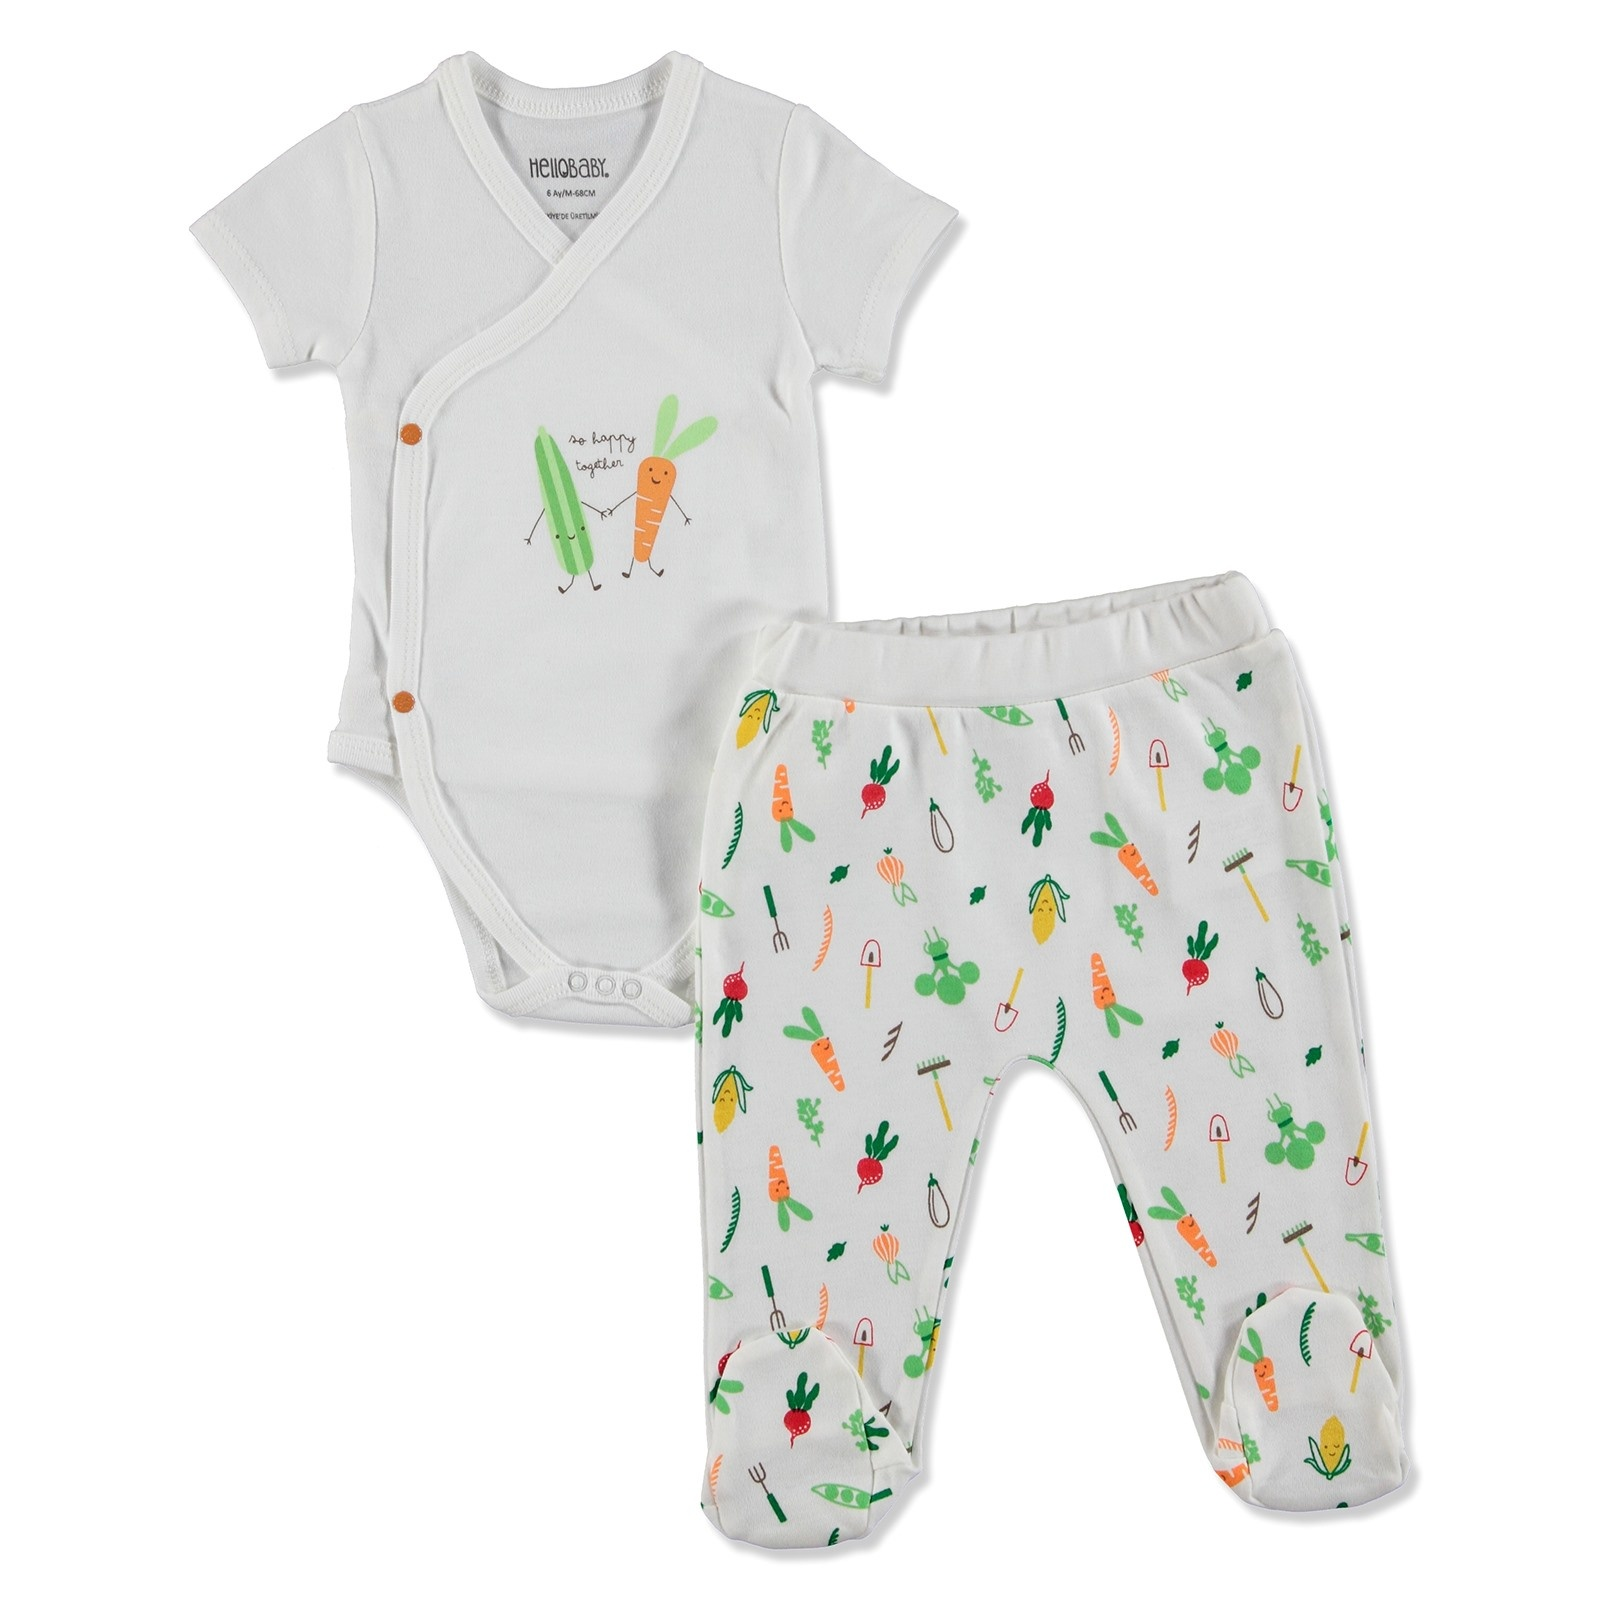 Ebebek HelloBaby Summer Baby Sweet Vegetables Bodysuits Footed Pants Set